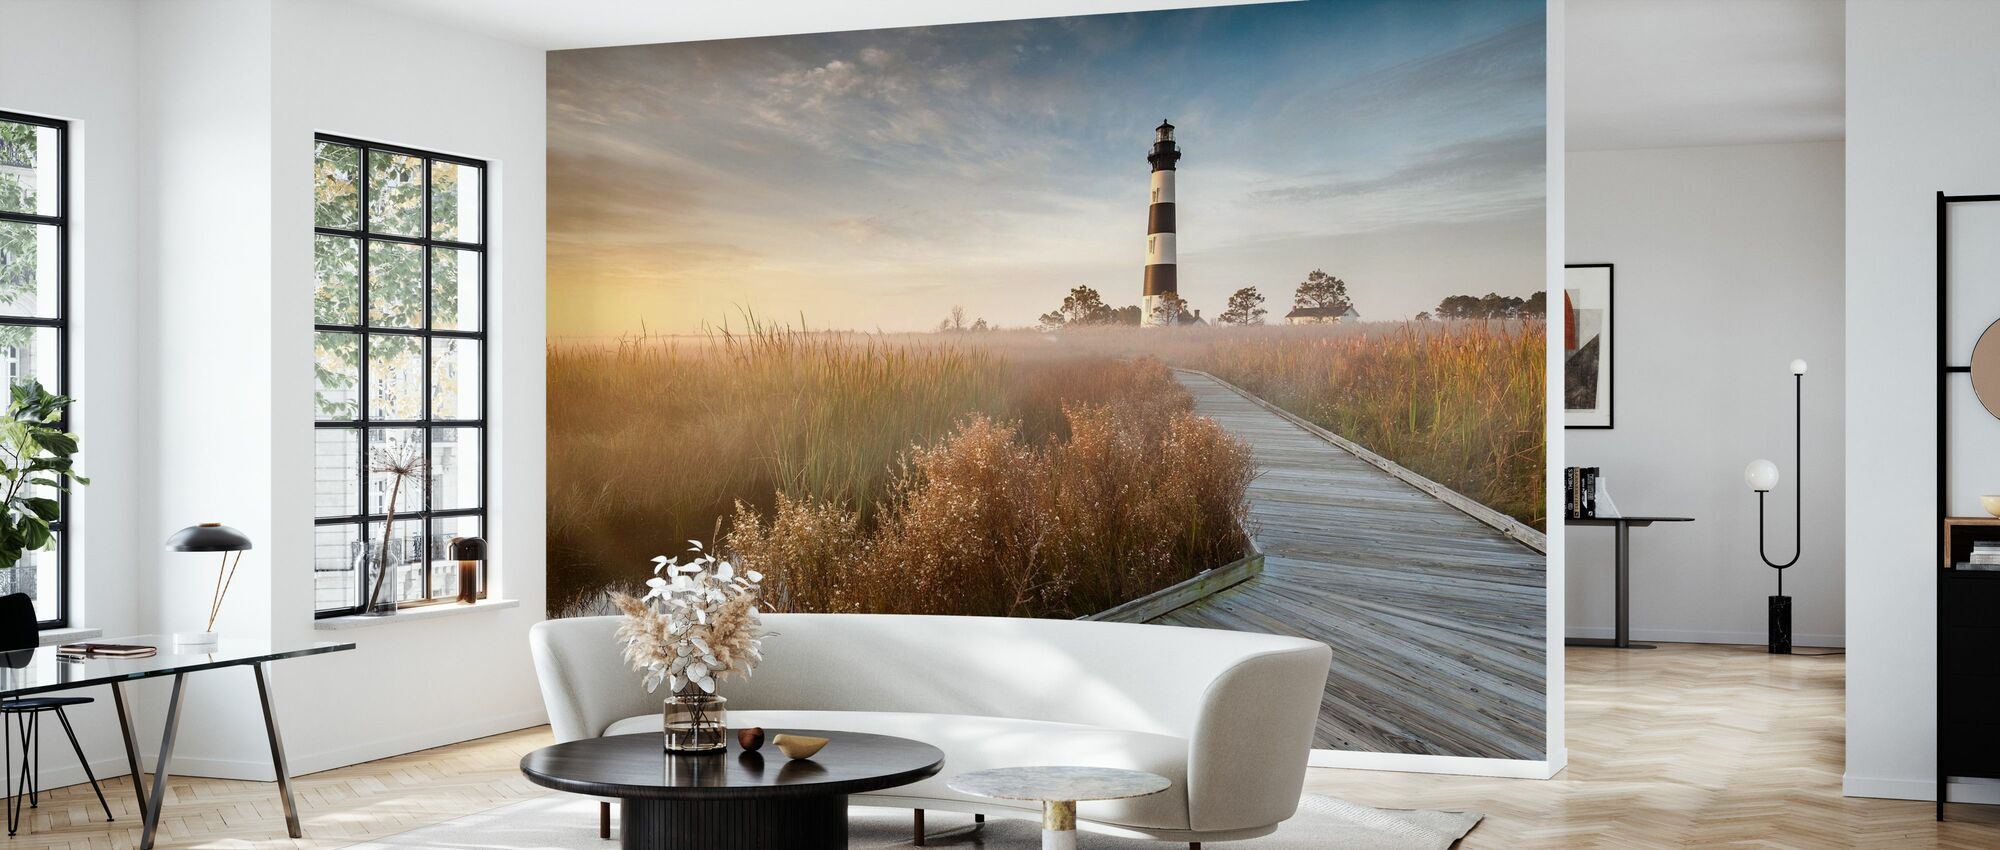 Lighthouse in North Carolina - Wallpaper - Living Room